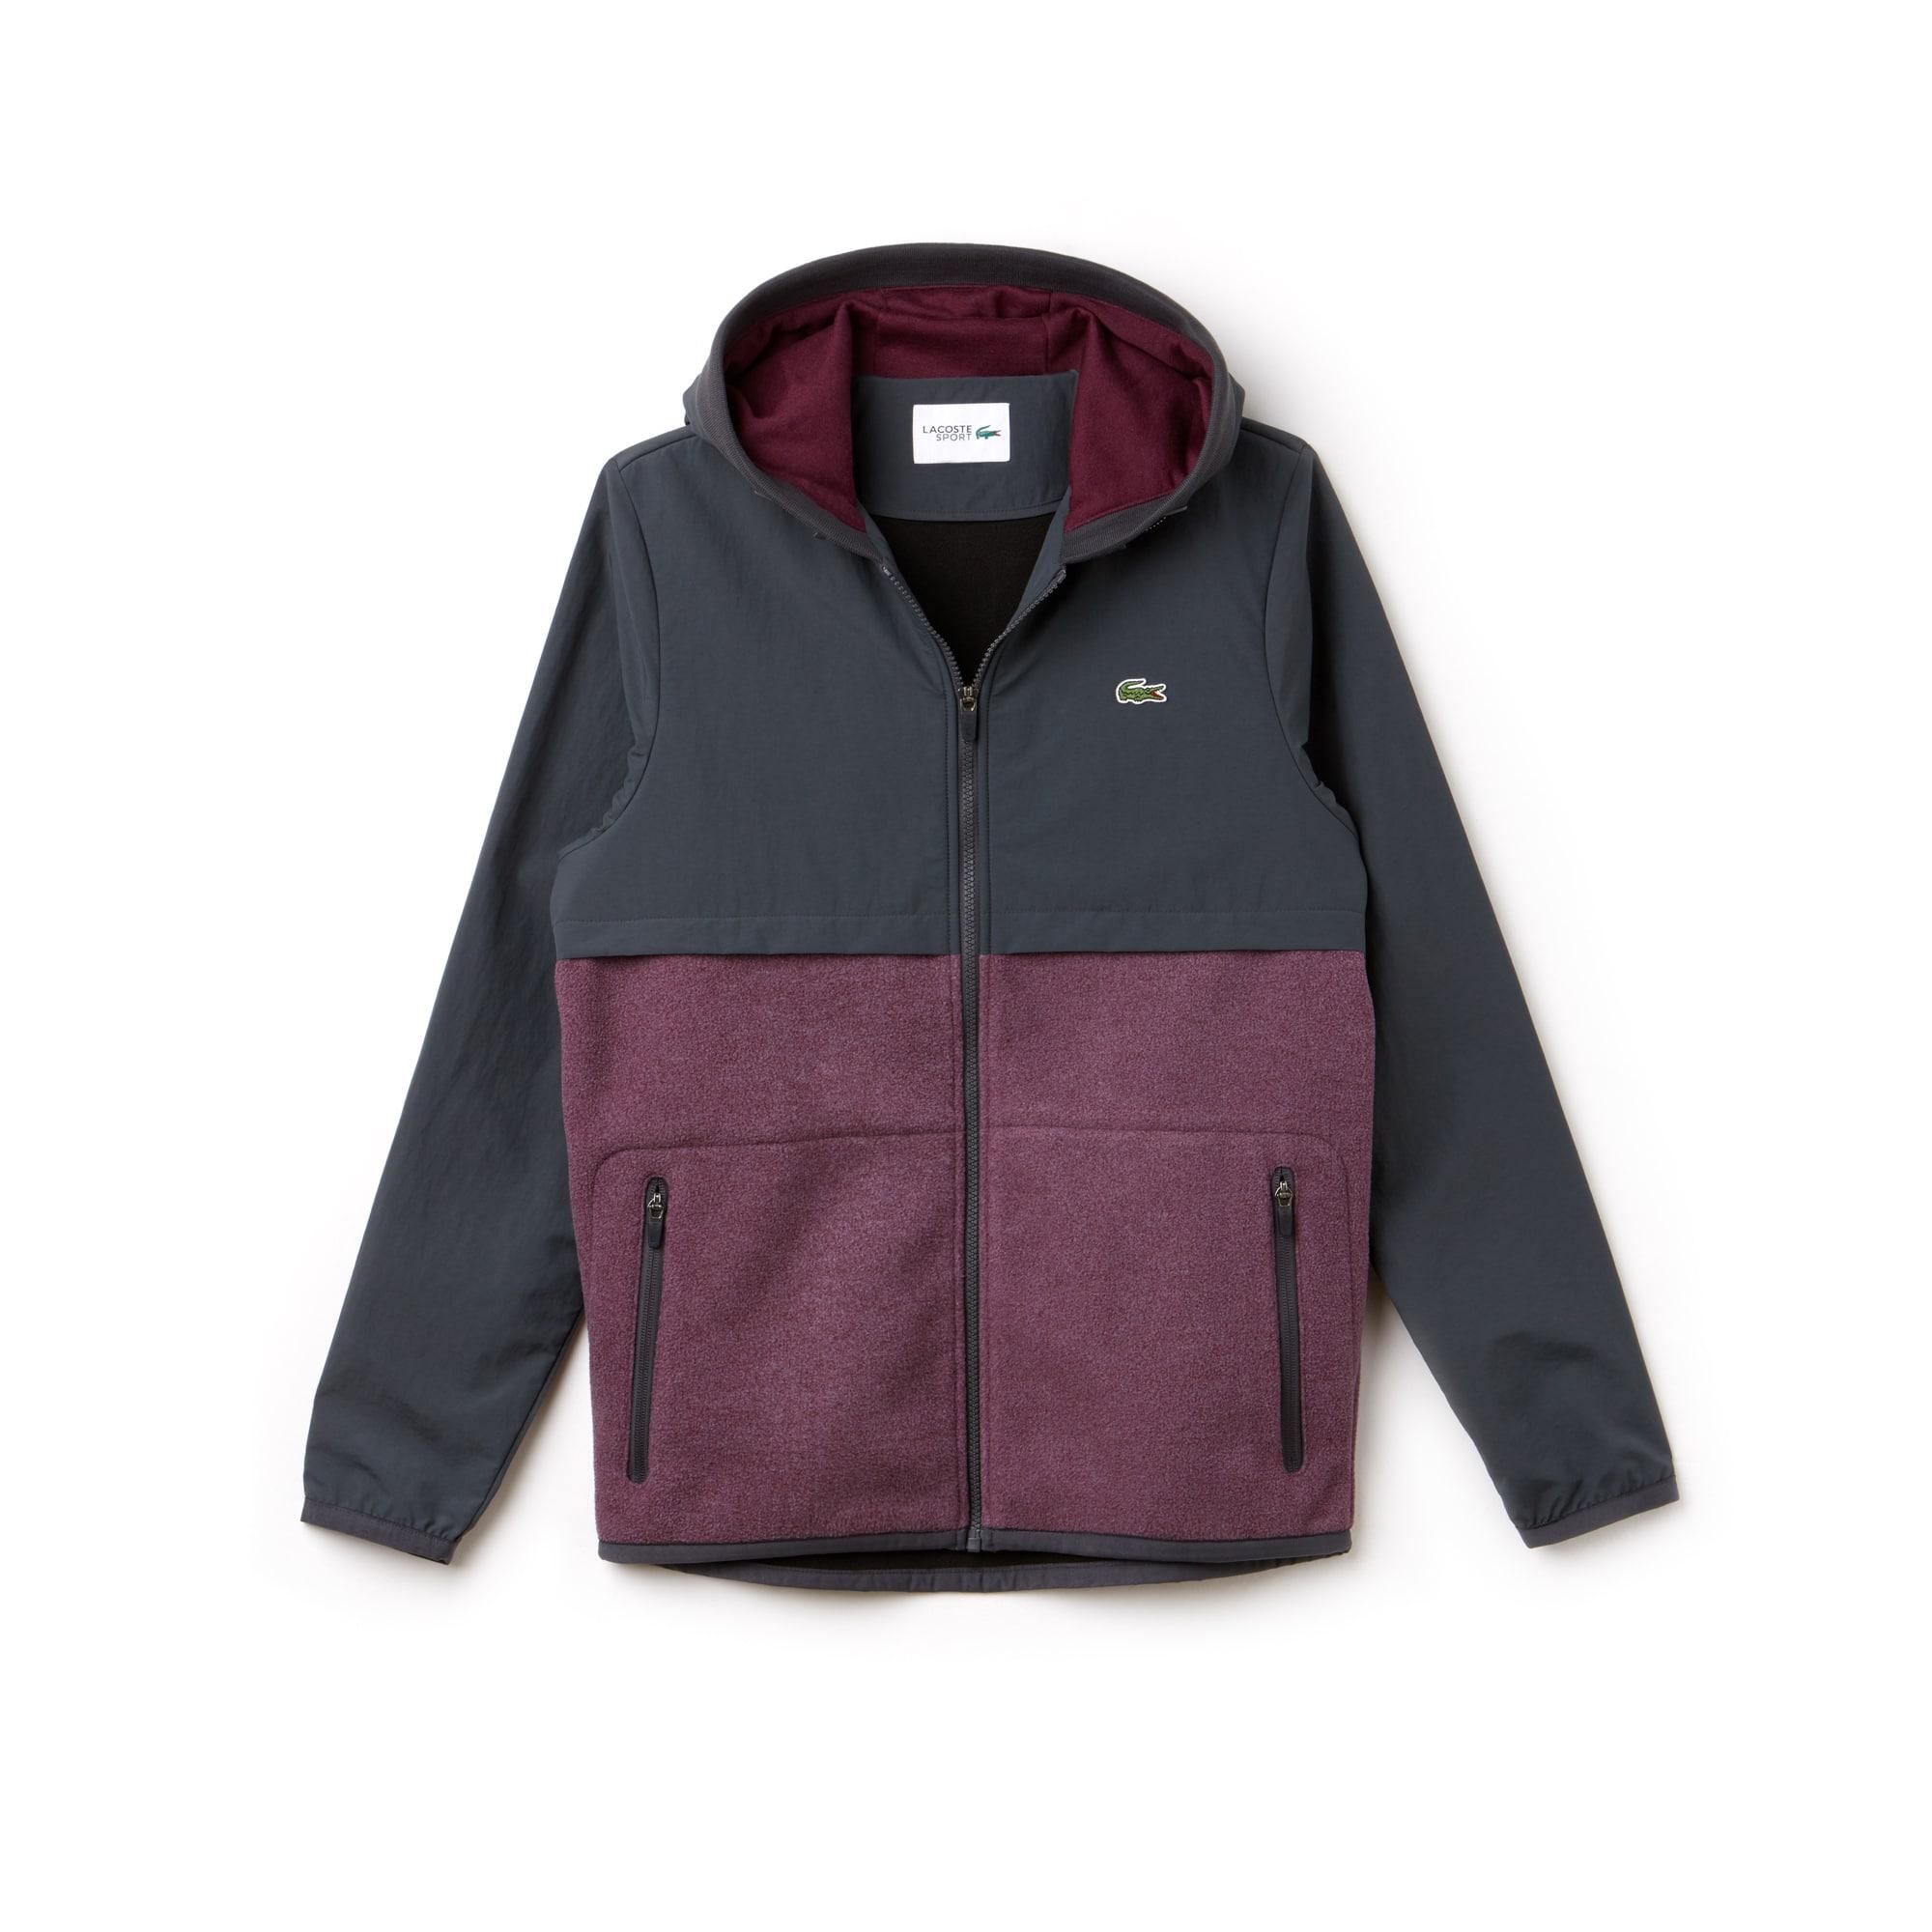 Men's Lacoste SPORT Hooded Bi-Material Colorblock Tennis Jacket